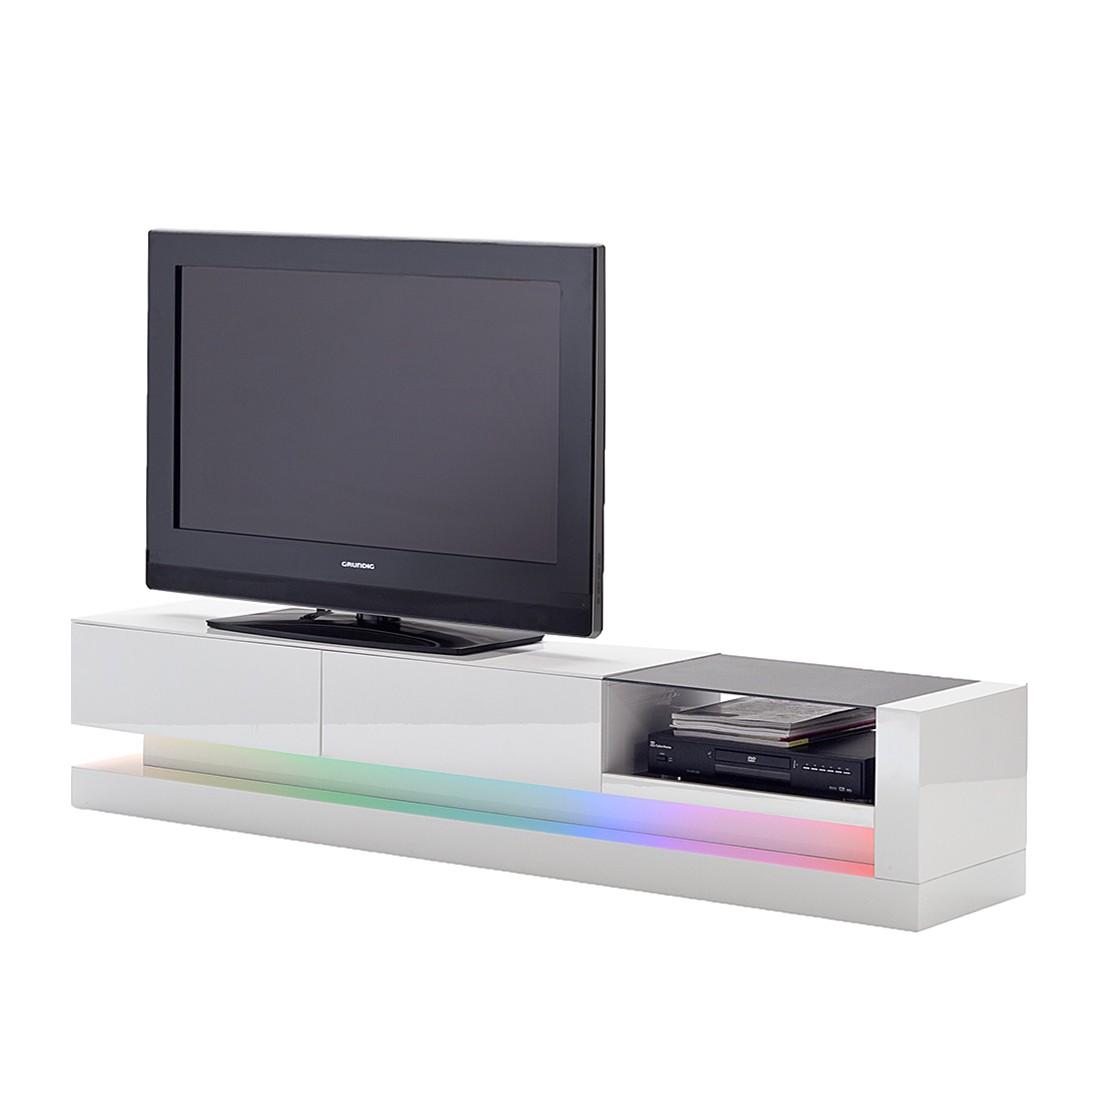 EEK A+, TV-Lowboard Twister – Mit RGB-LED Beleuchtung, loftscape günstig